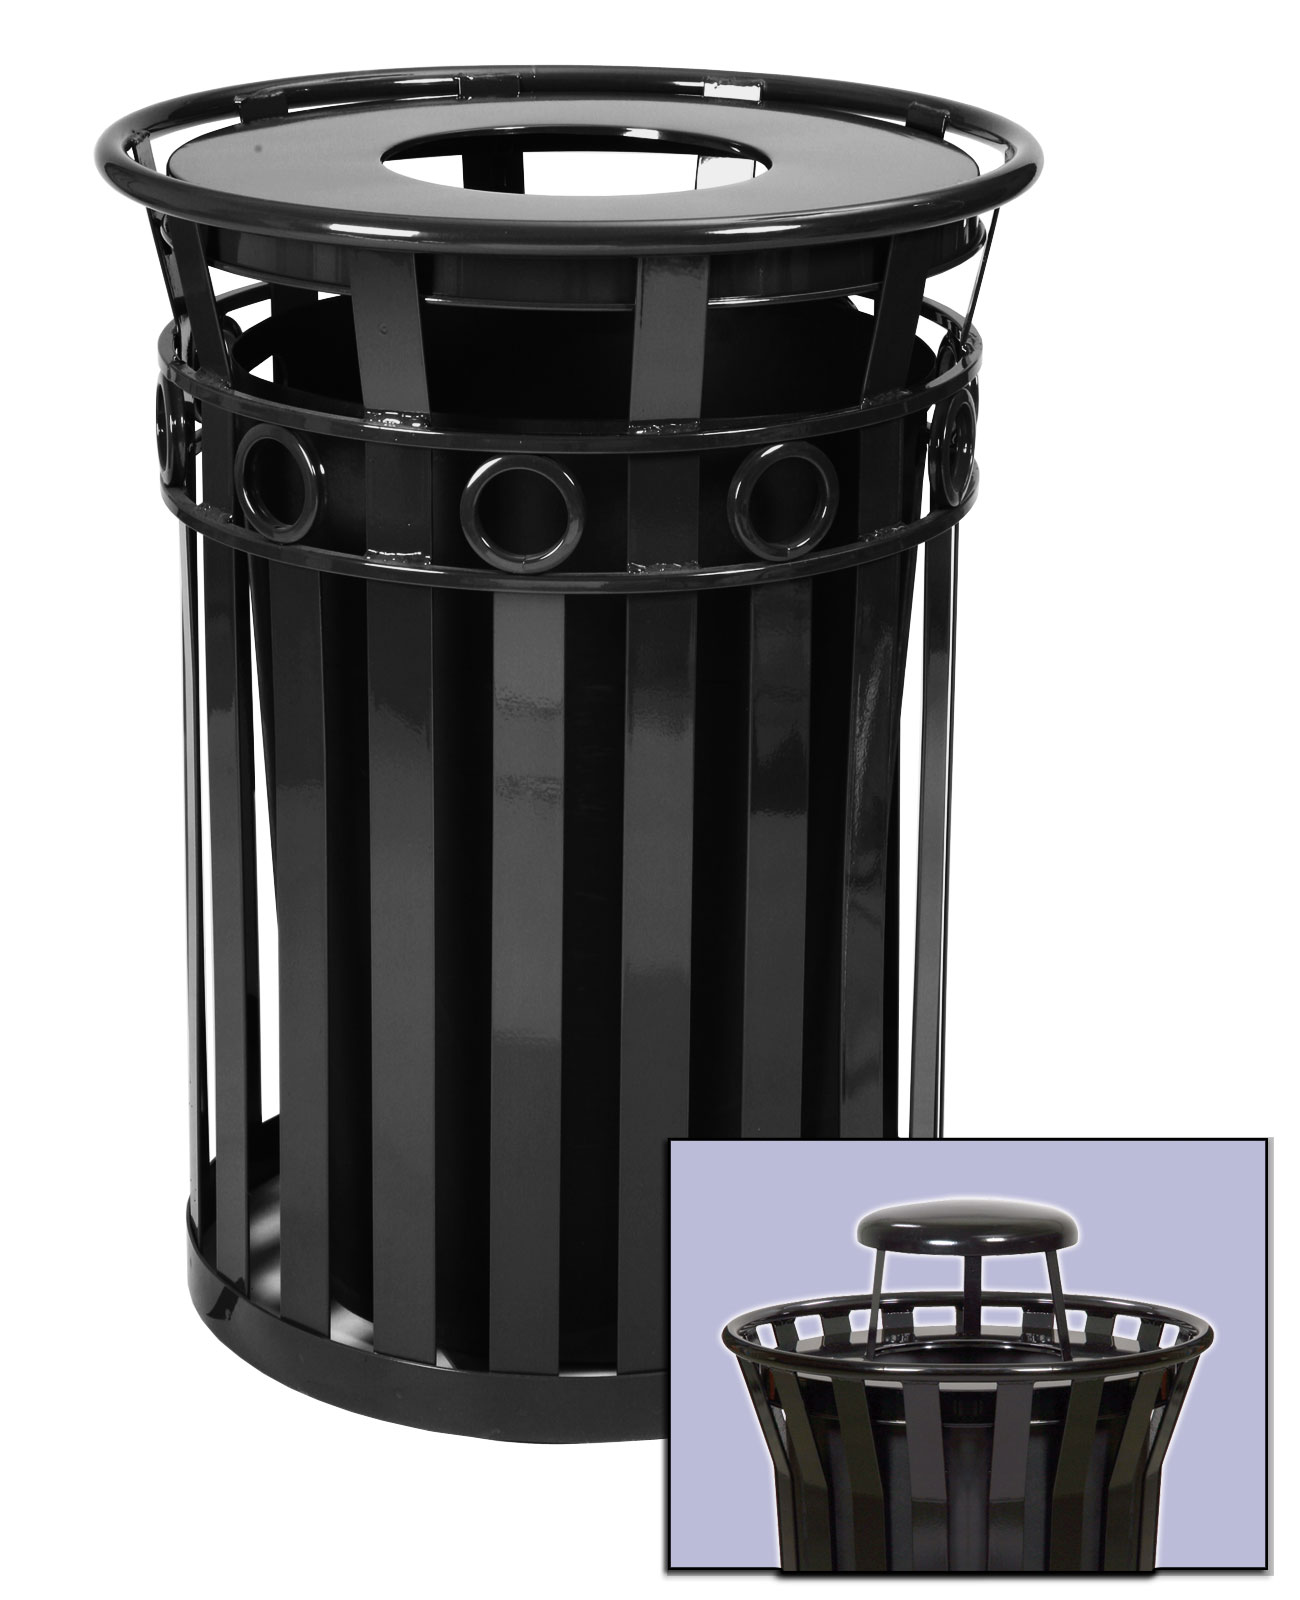 Trash receptacle and rain cap, Outdoor